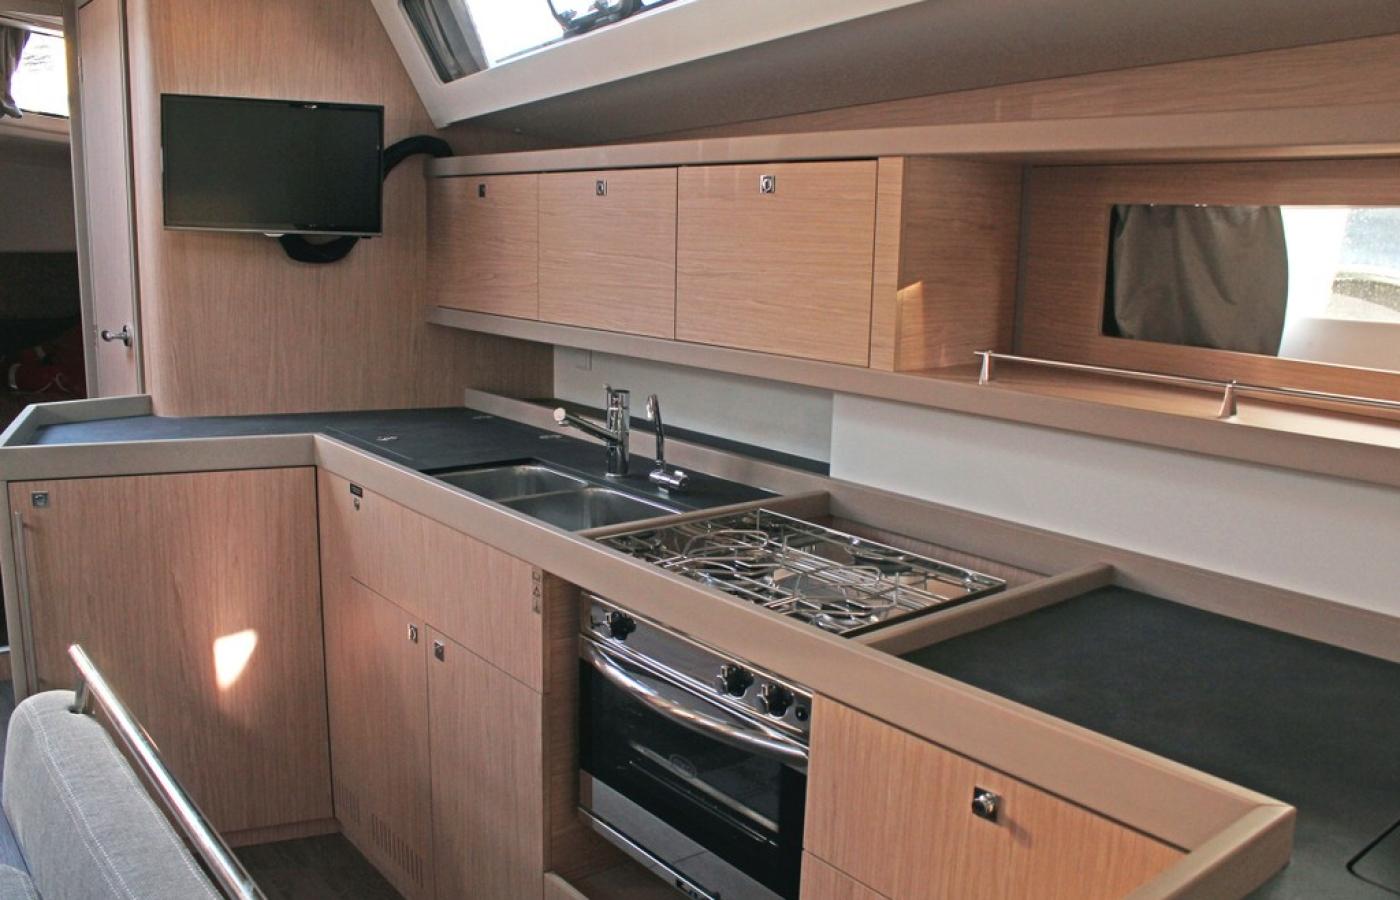 Modern appliances inside the galley